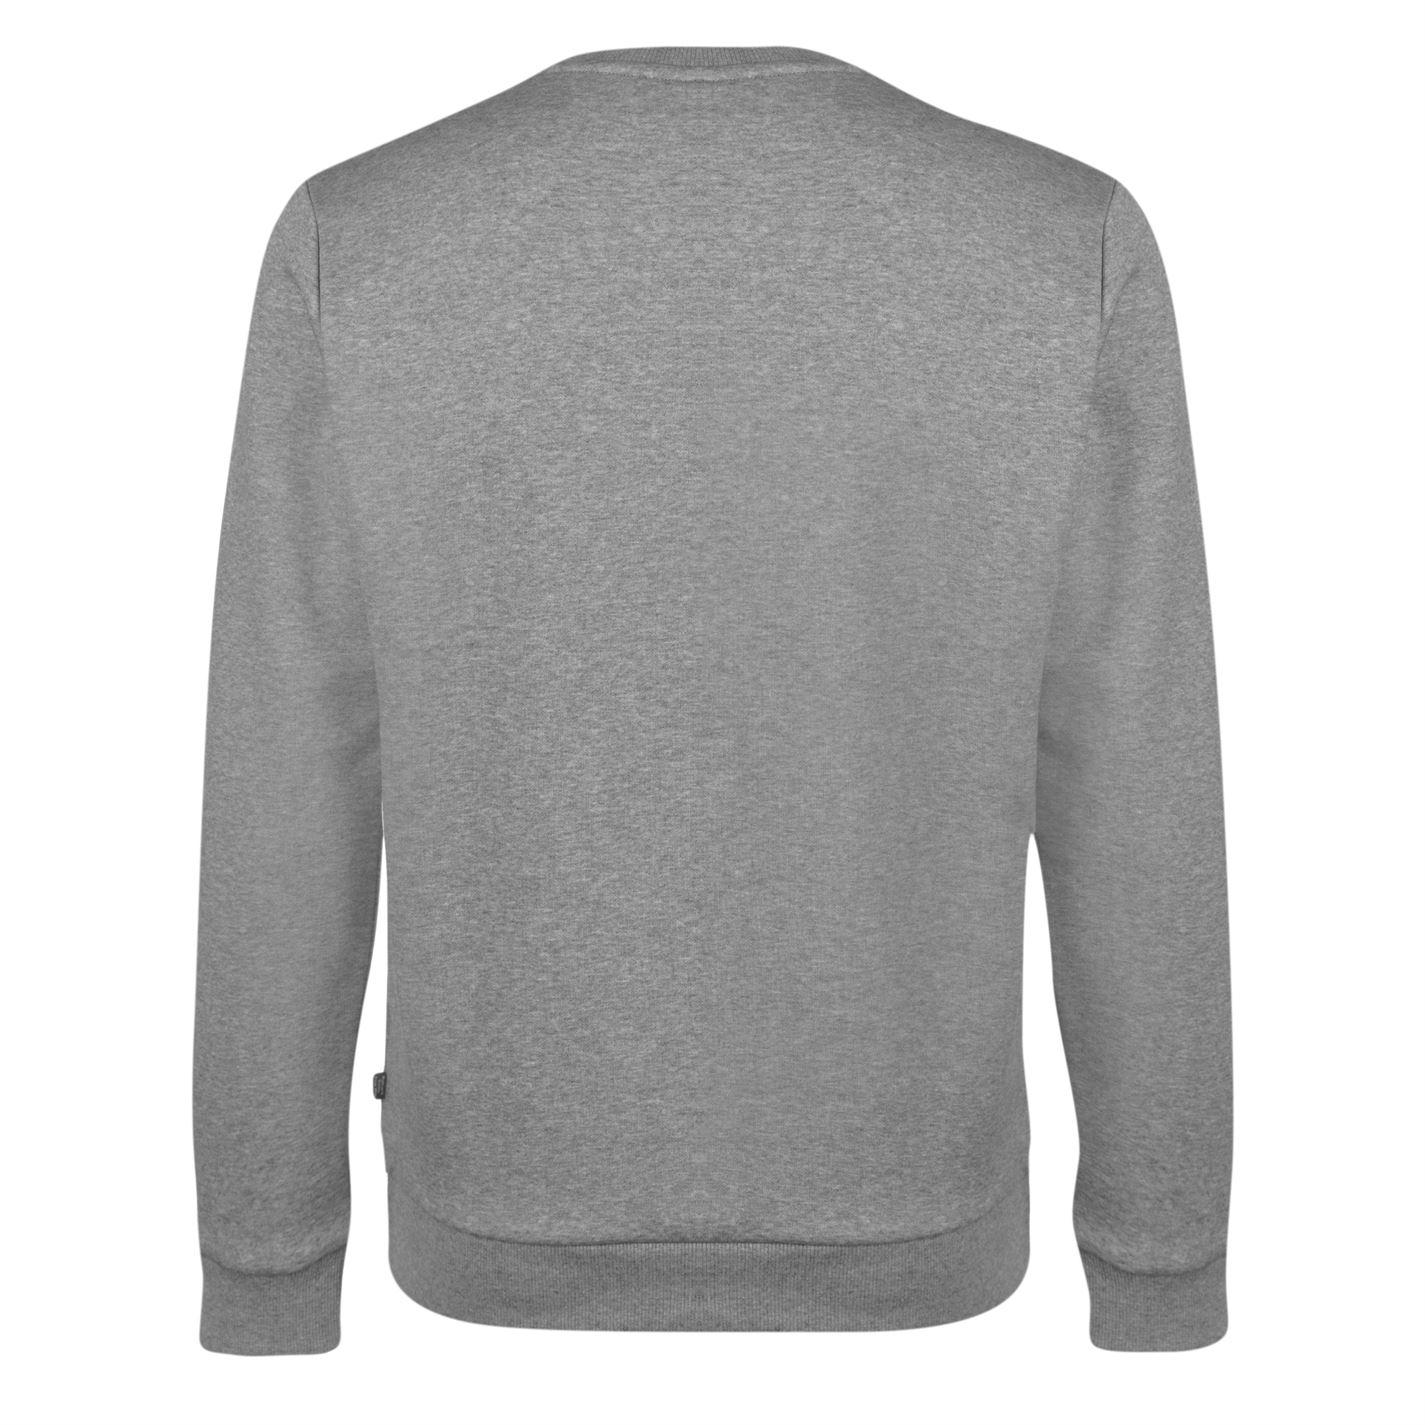 9f314778e8 Puma Mens No1 Crew Sweater Jumper Pullover Long Sleeve Neck Warm ...